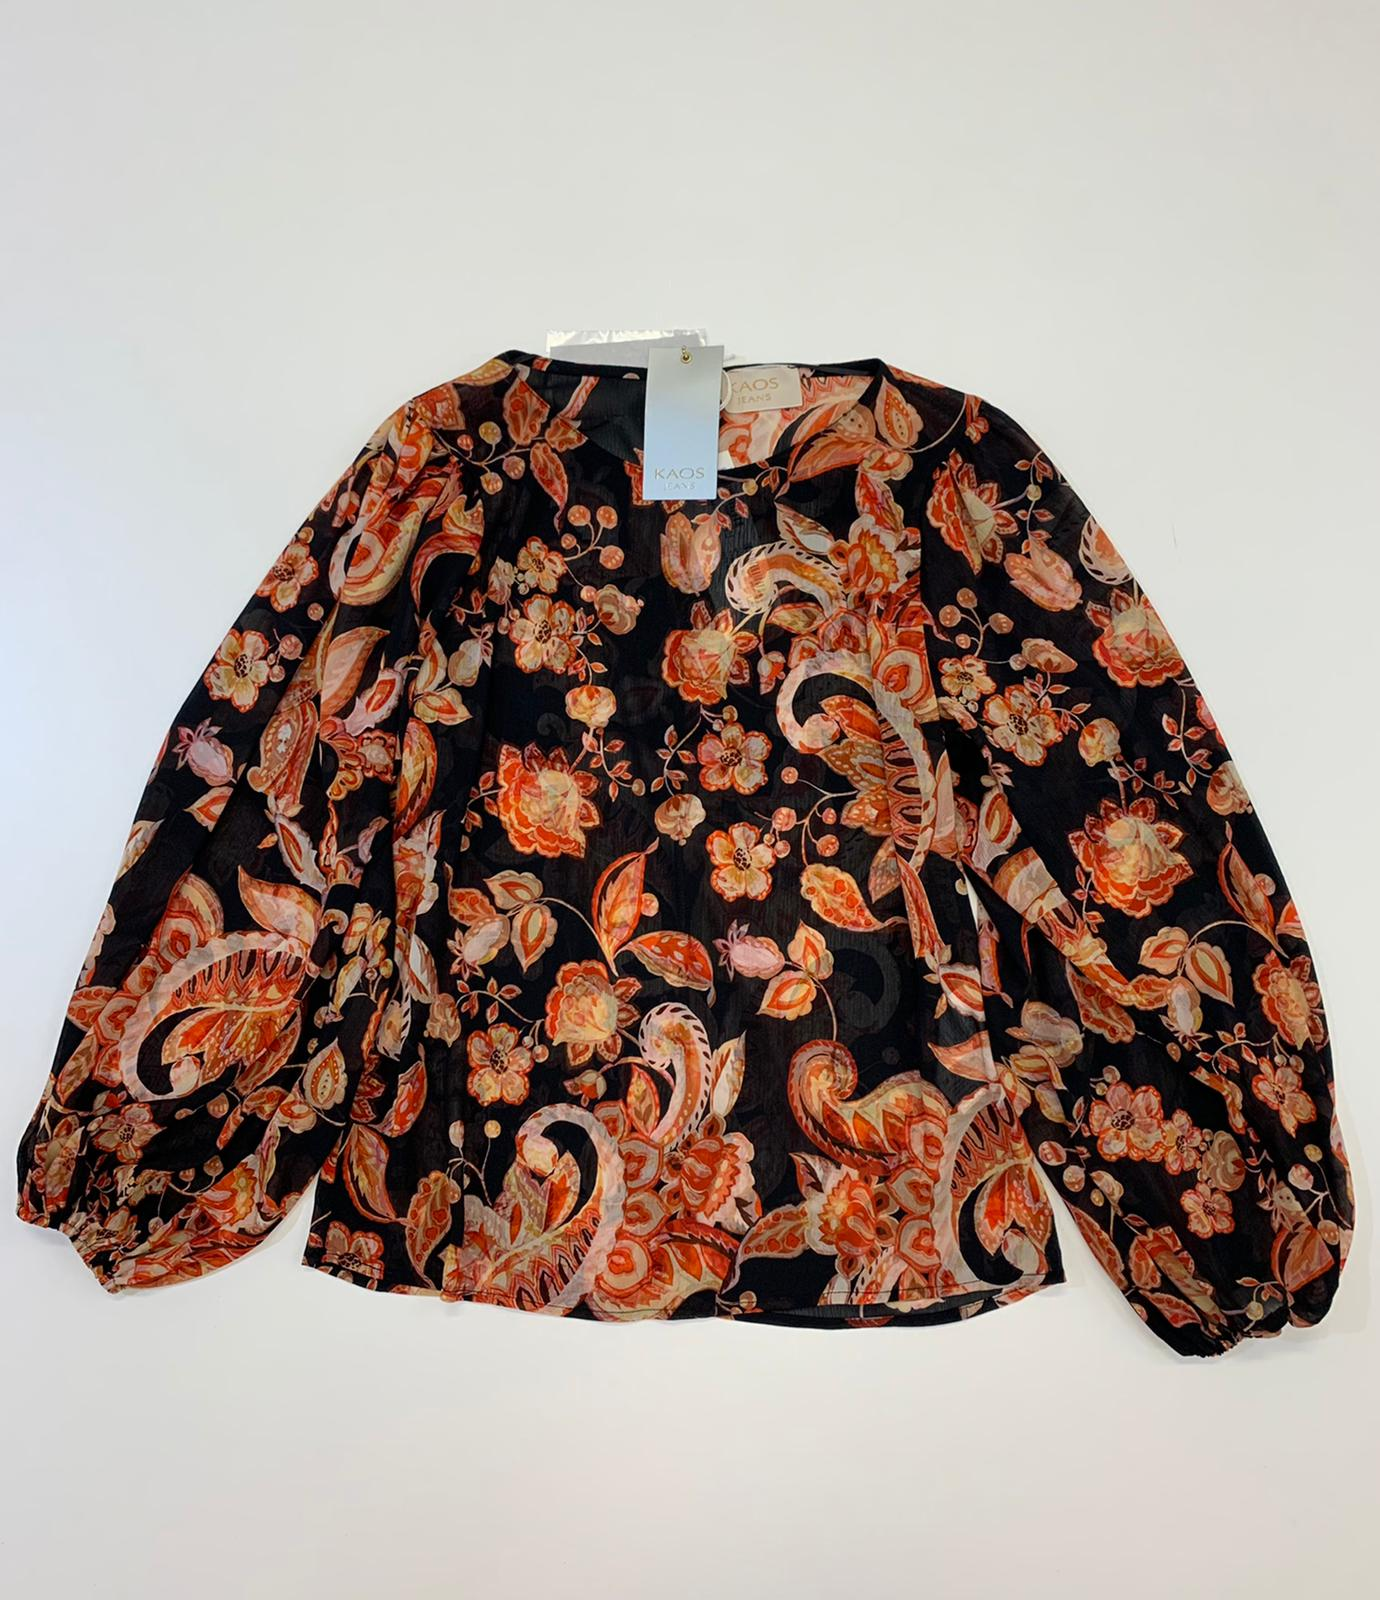 Blusa Donna Kaos Jeans Fabt Arancio